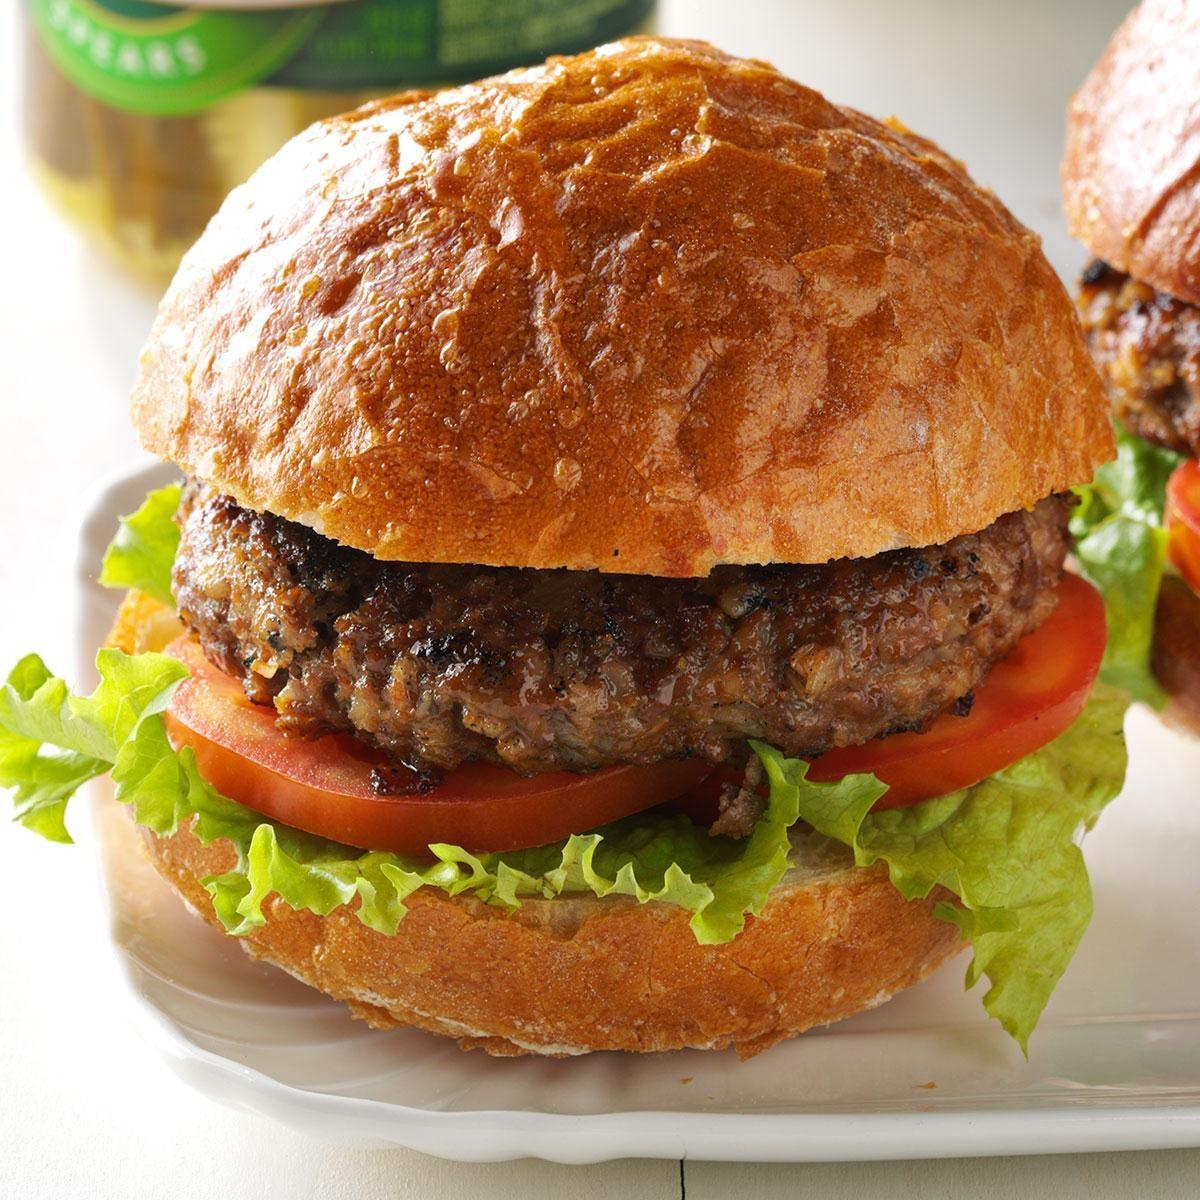 barley beef burgers recipe taste of home. Black Bedroom Furniture Sets. Home Design Ideas